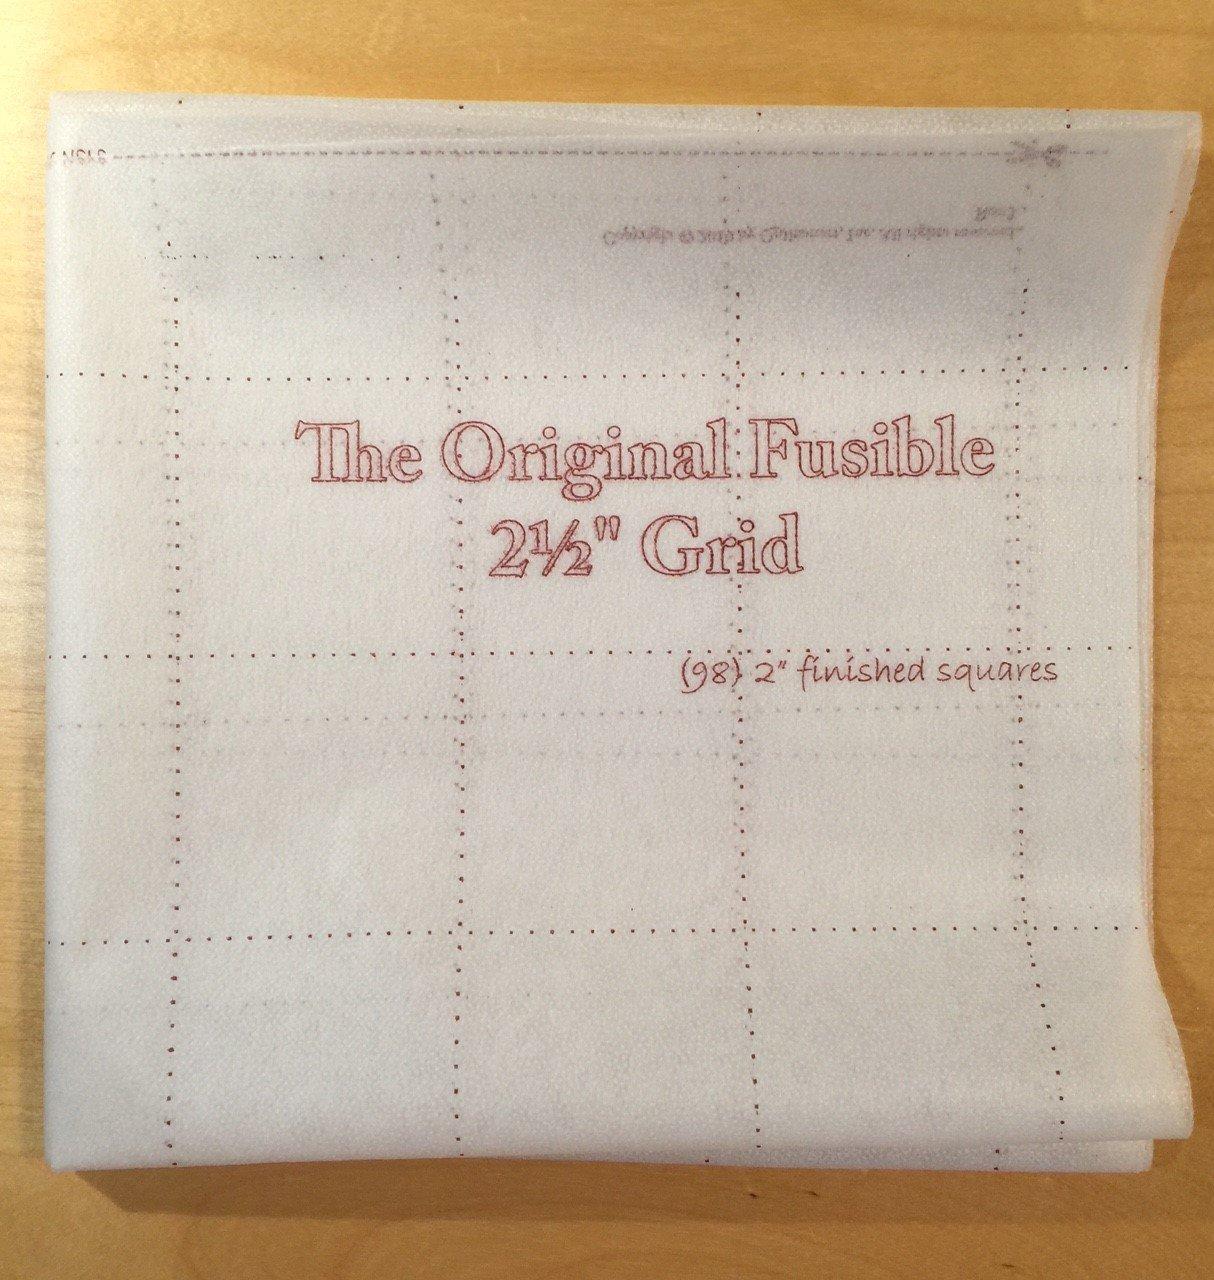 The Original Fusible 2.5 Grid Panel